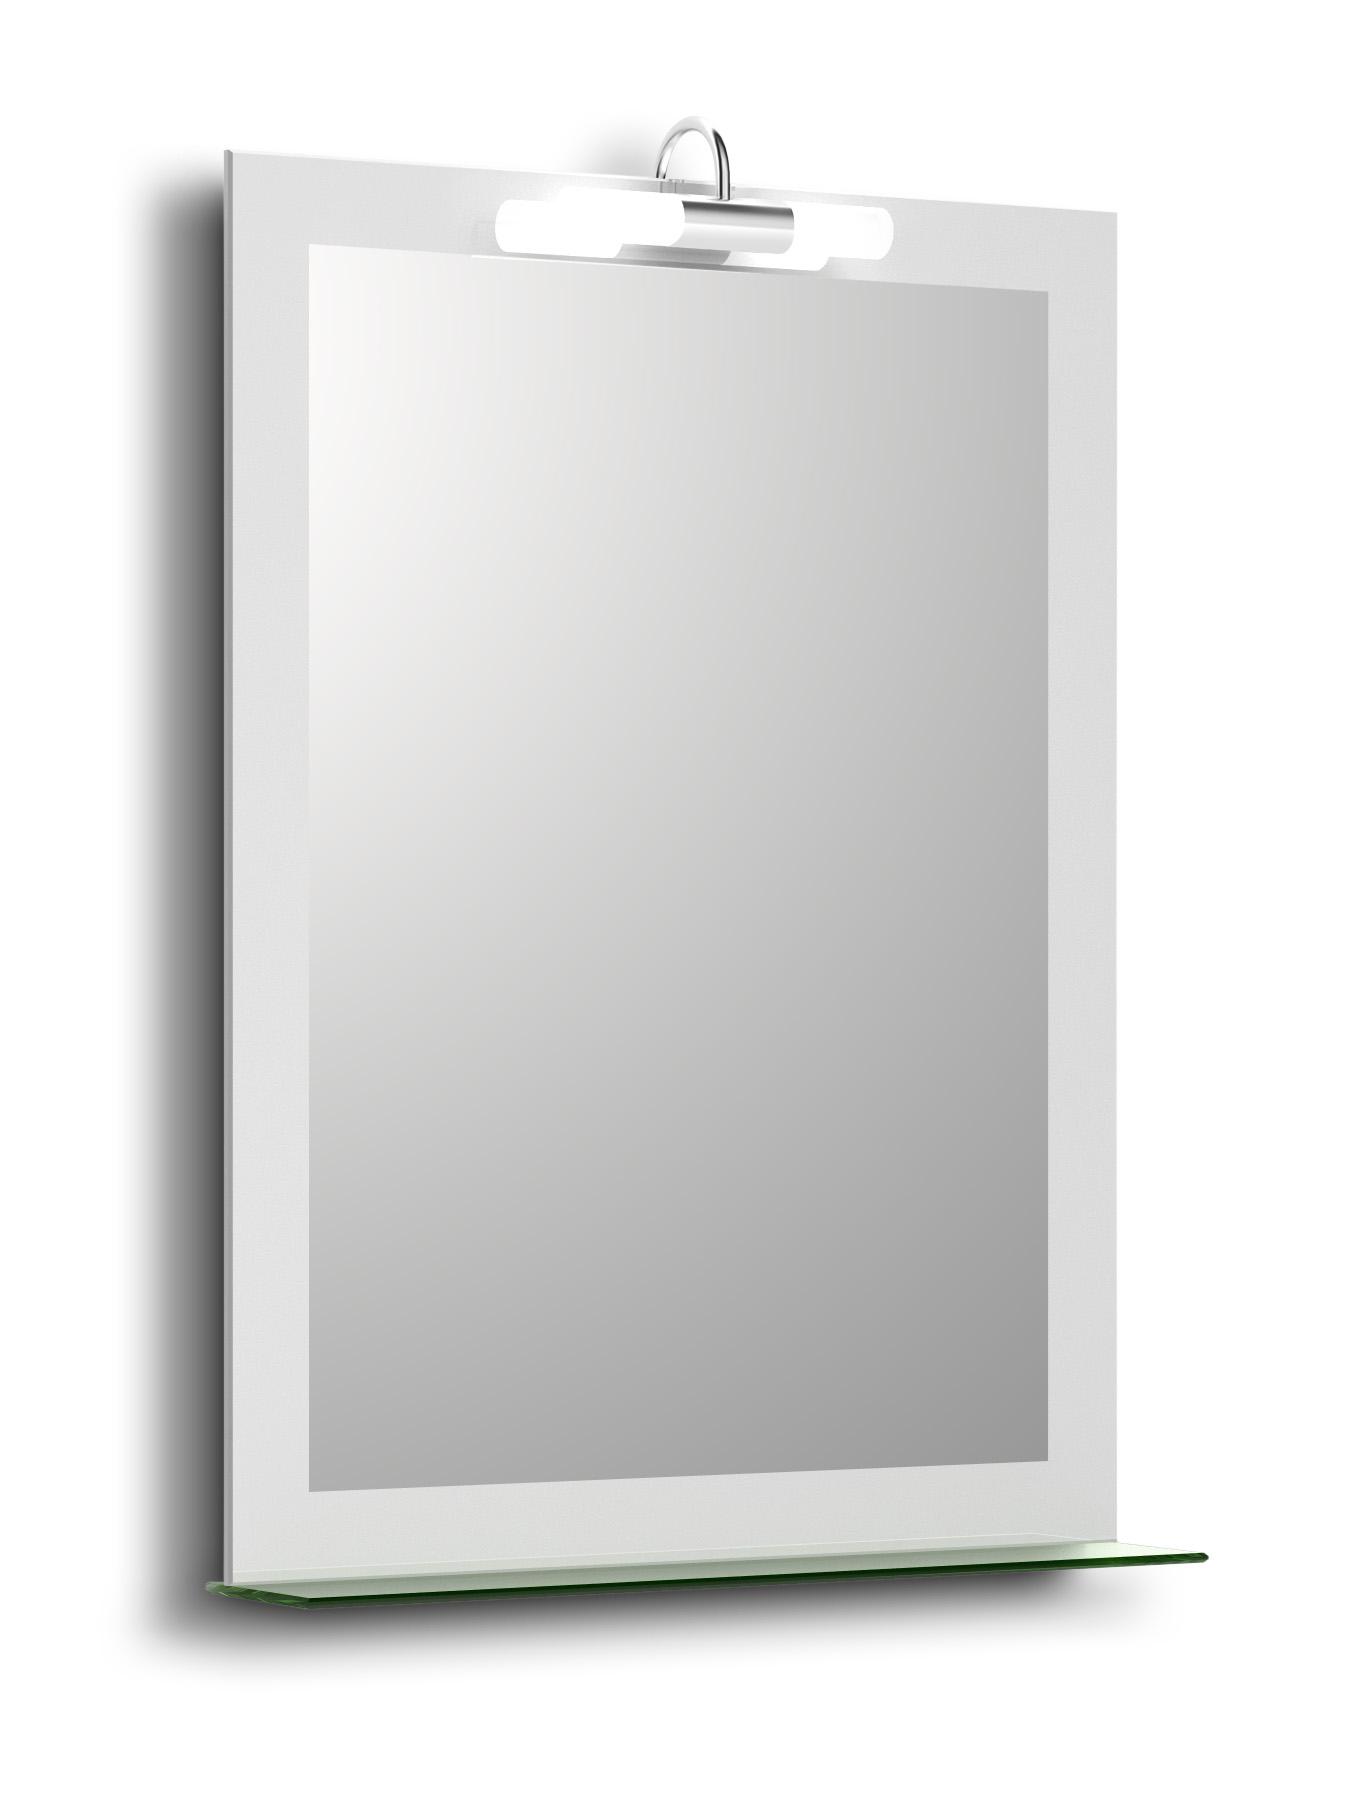 Oglinda baie cu polita si lampa halogen Alviela 80x60 cm imagine